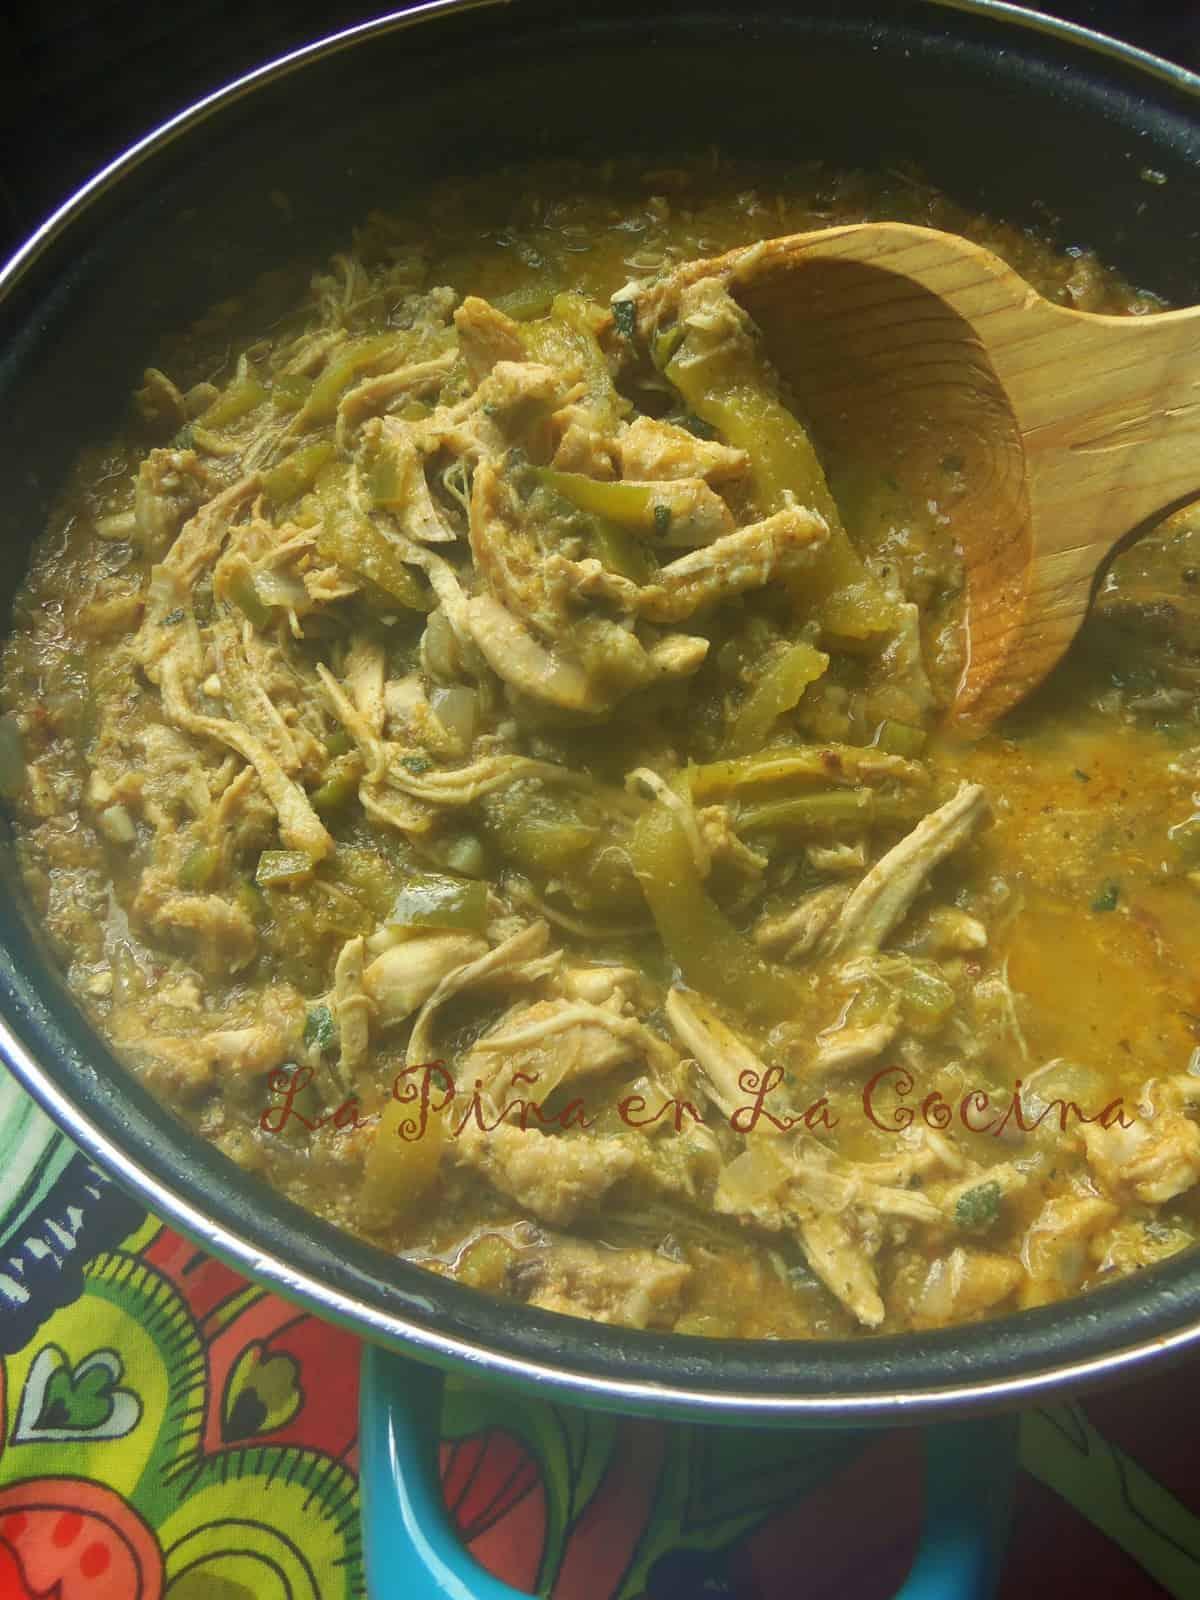 Chicken Chile Verde Pollo Con Chile Verde  La Pia en